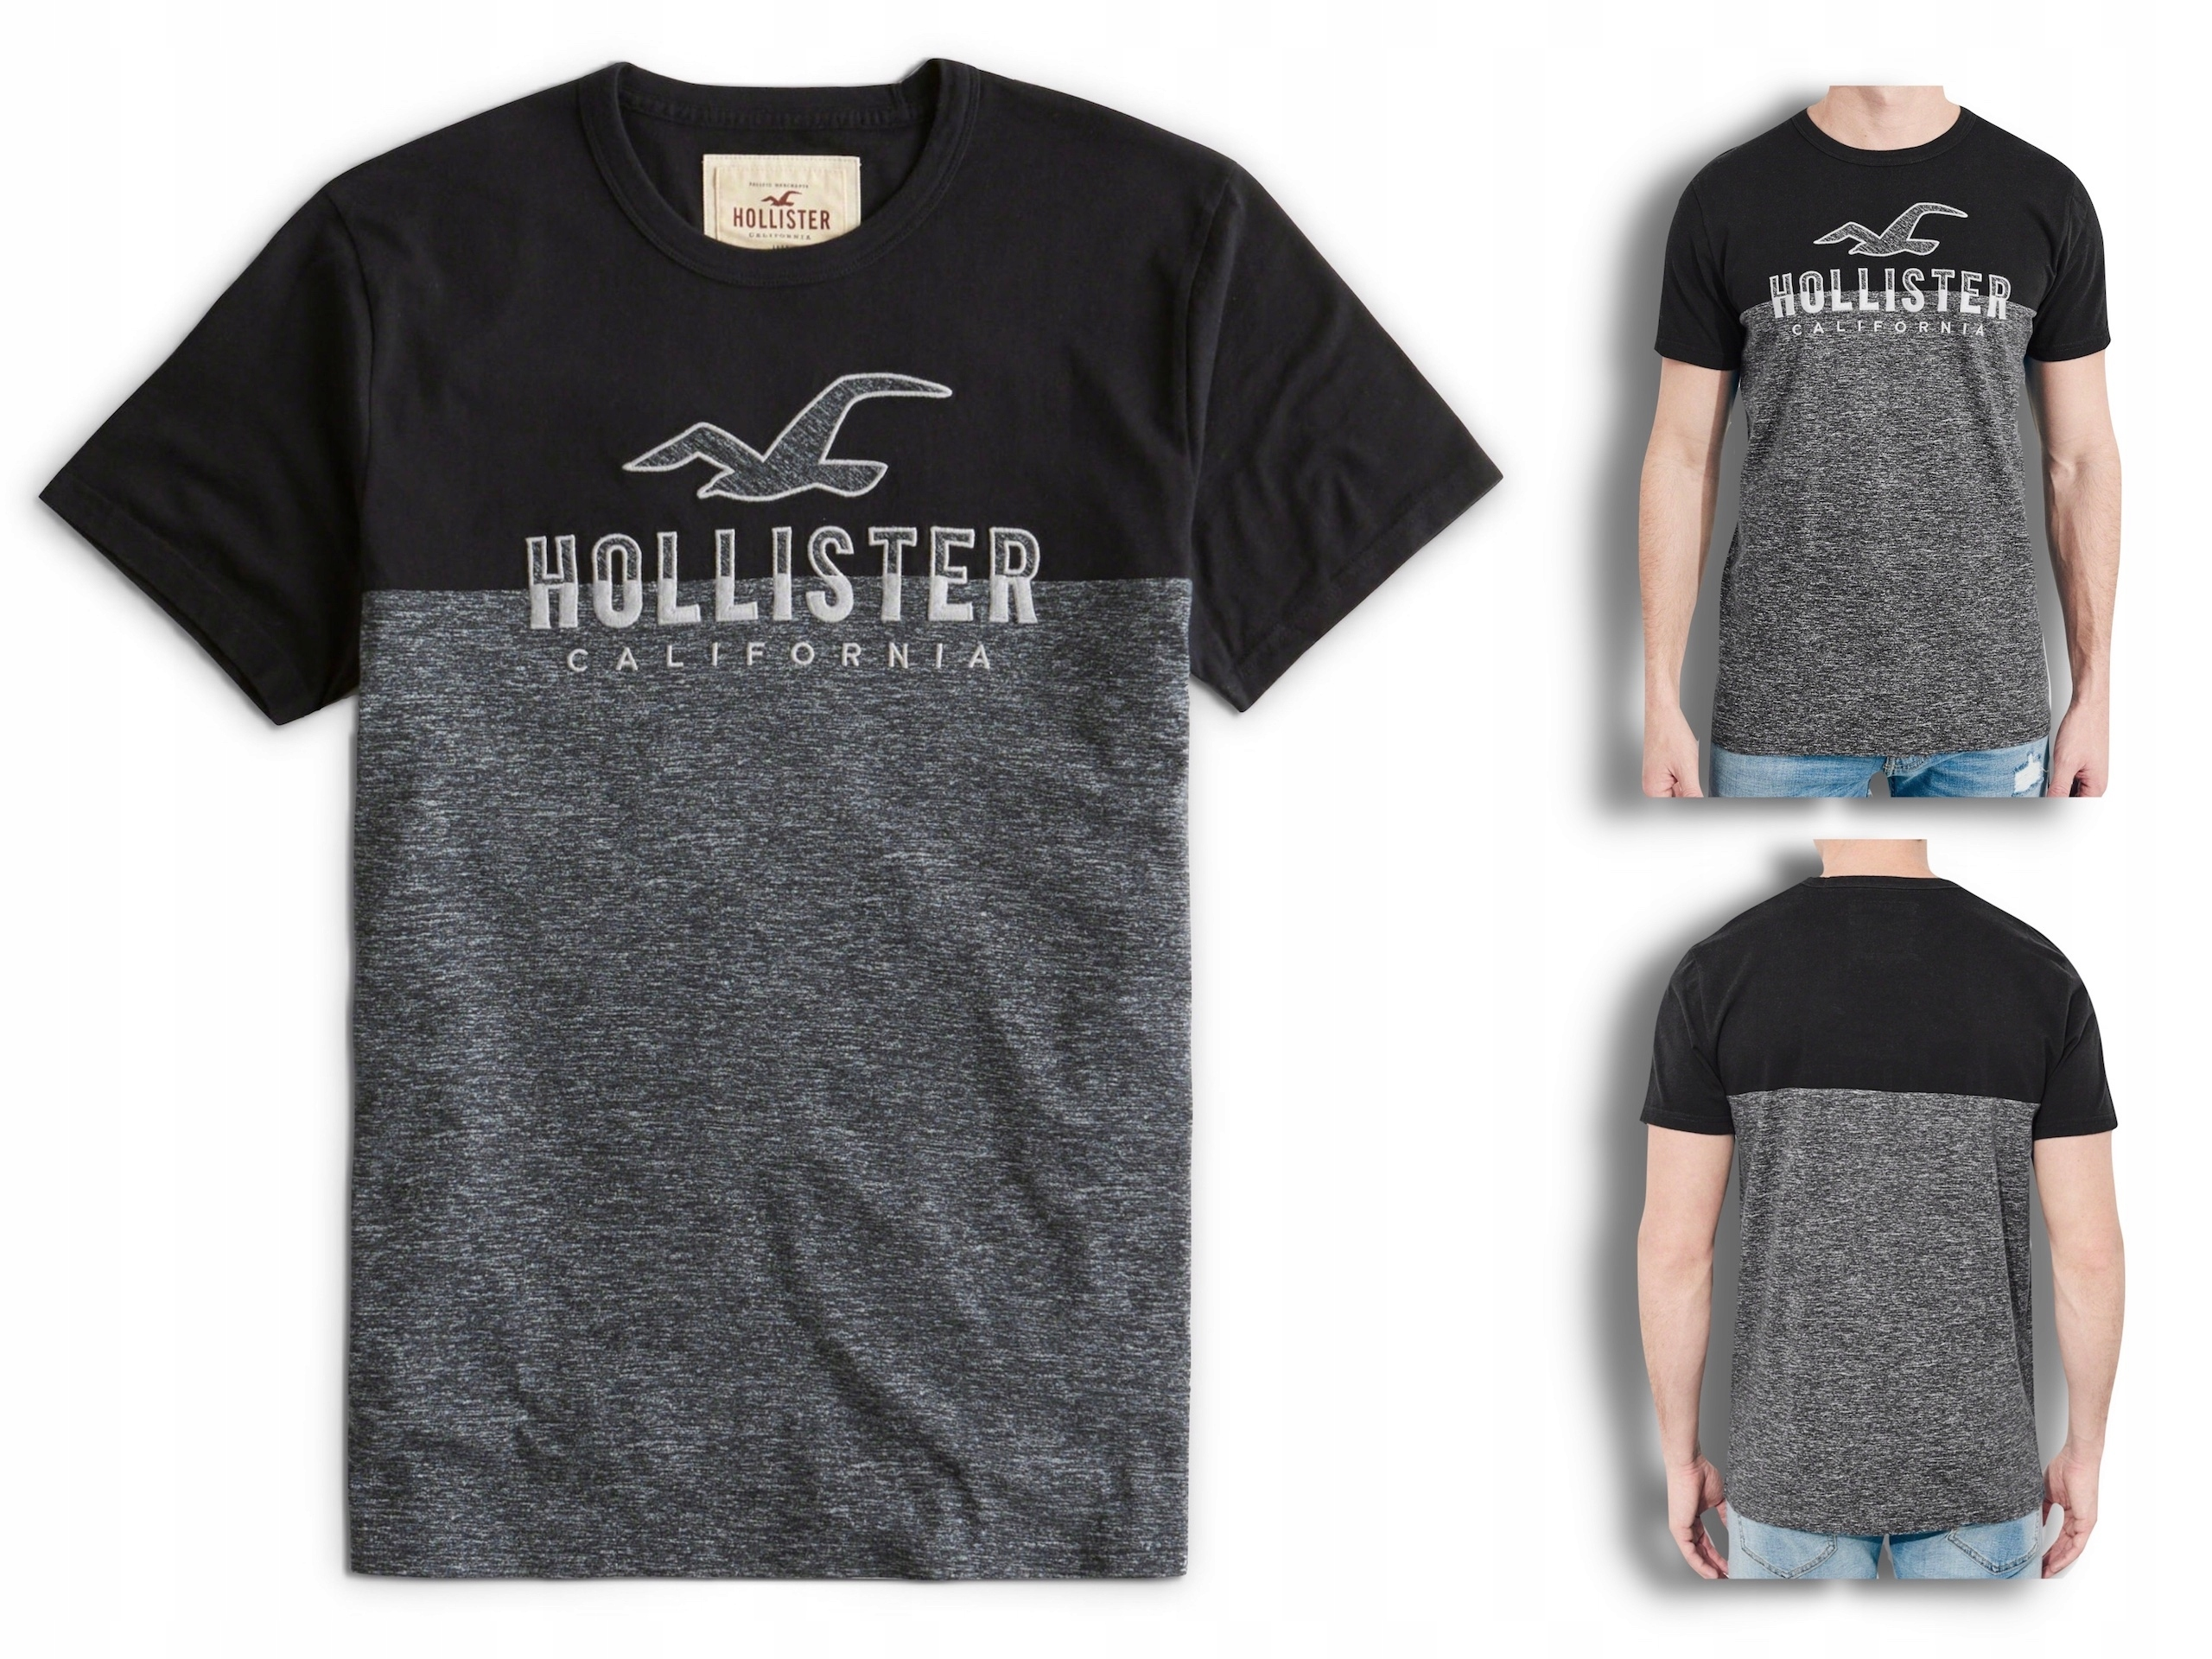 HOLLISTER by Abercrombie T-shirt Koszulka USA S